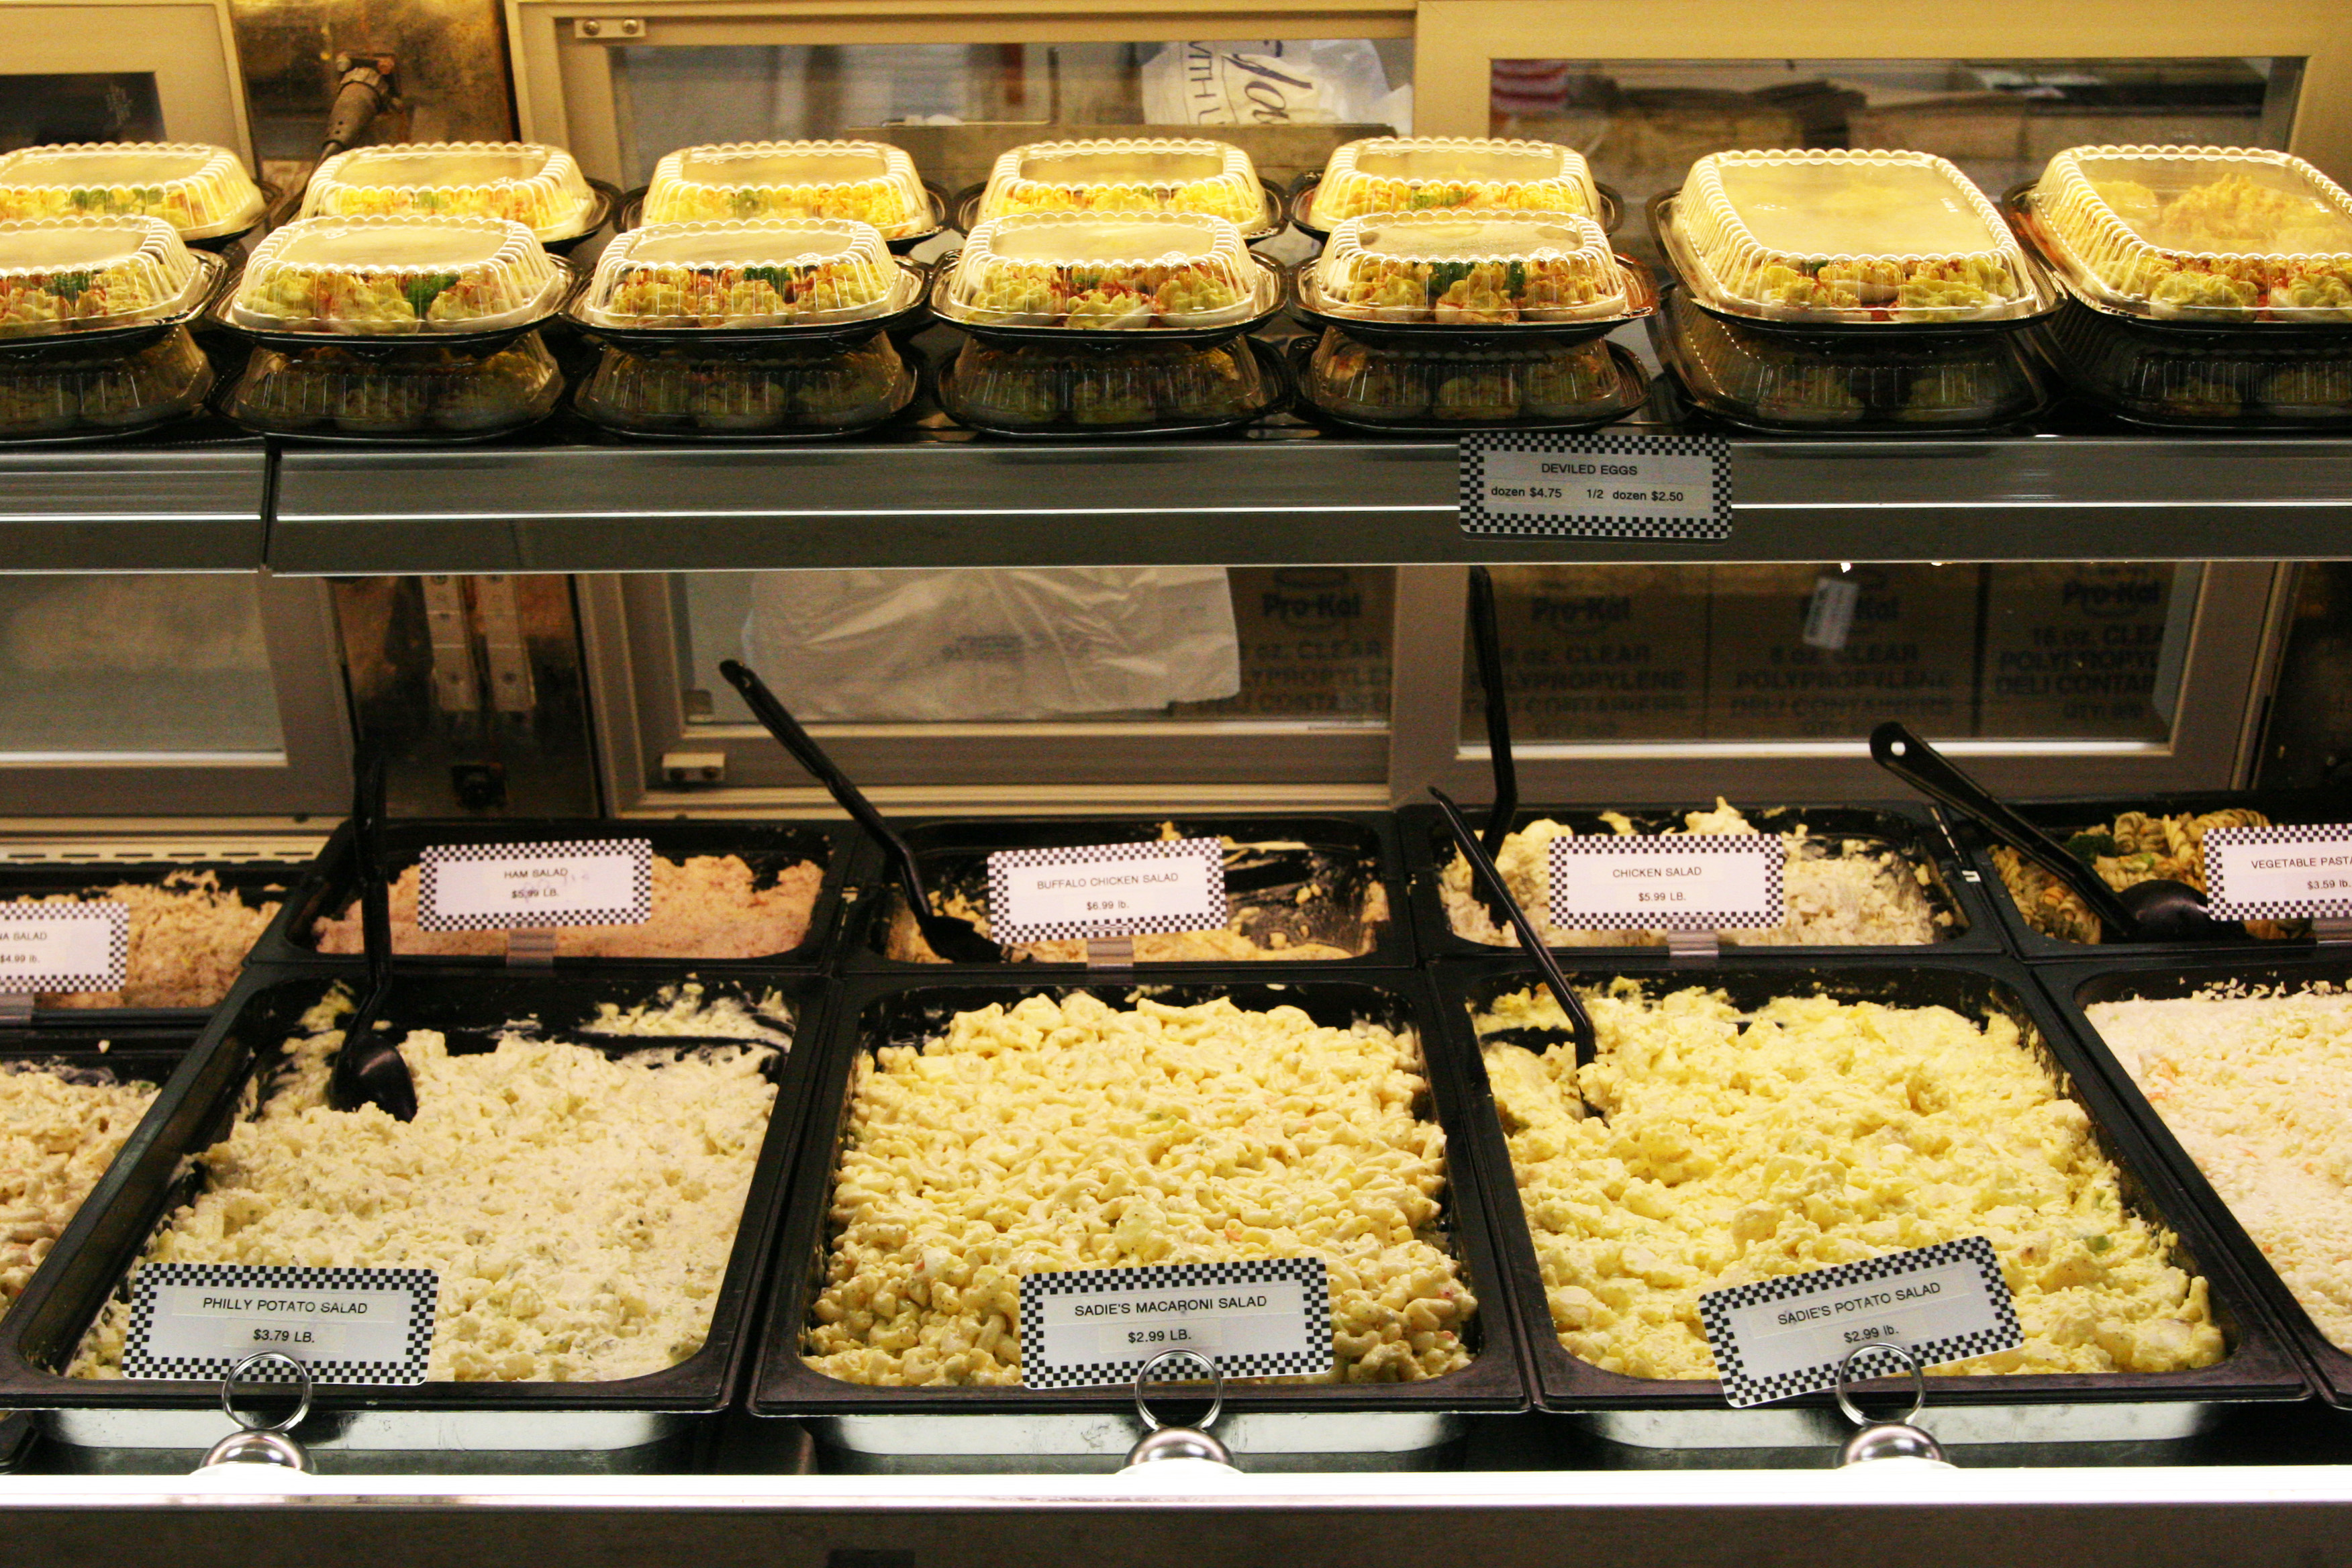 Ben L Stoltzfus Deli Lunch Meats Cheese Bristol Amish Market PA NJ